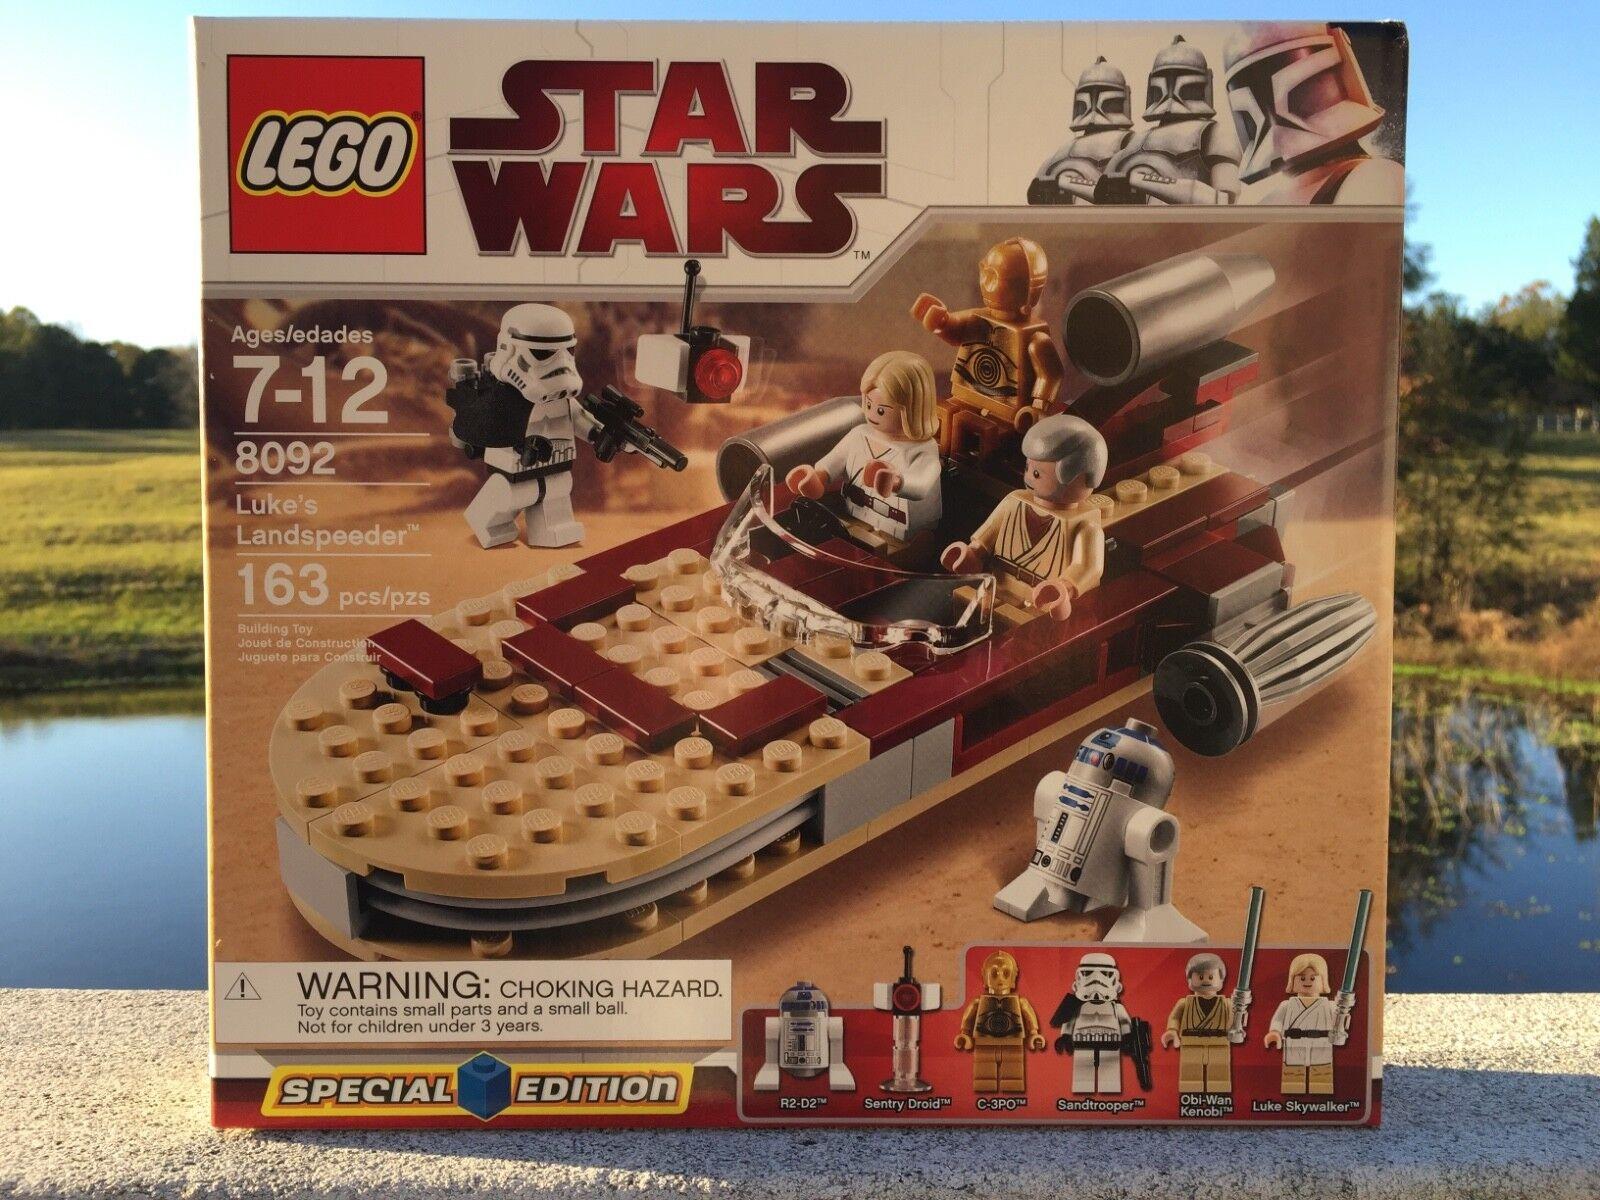 LEGO Star Wars Luke's Landspeeder (8092) Special Edition  New in Sealed Box NISB